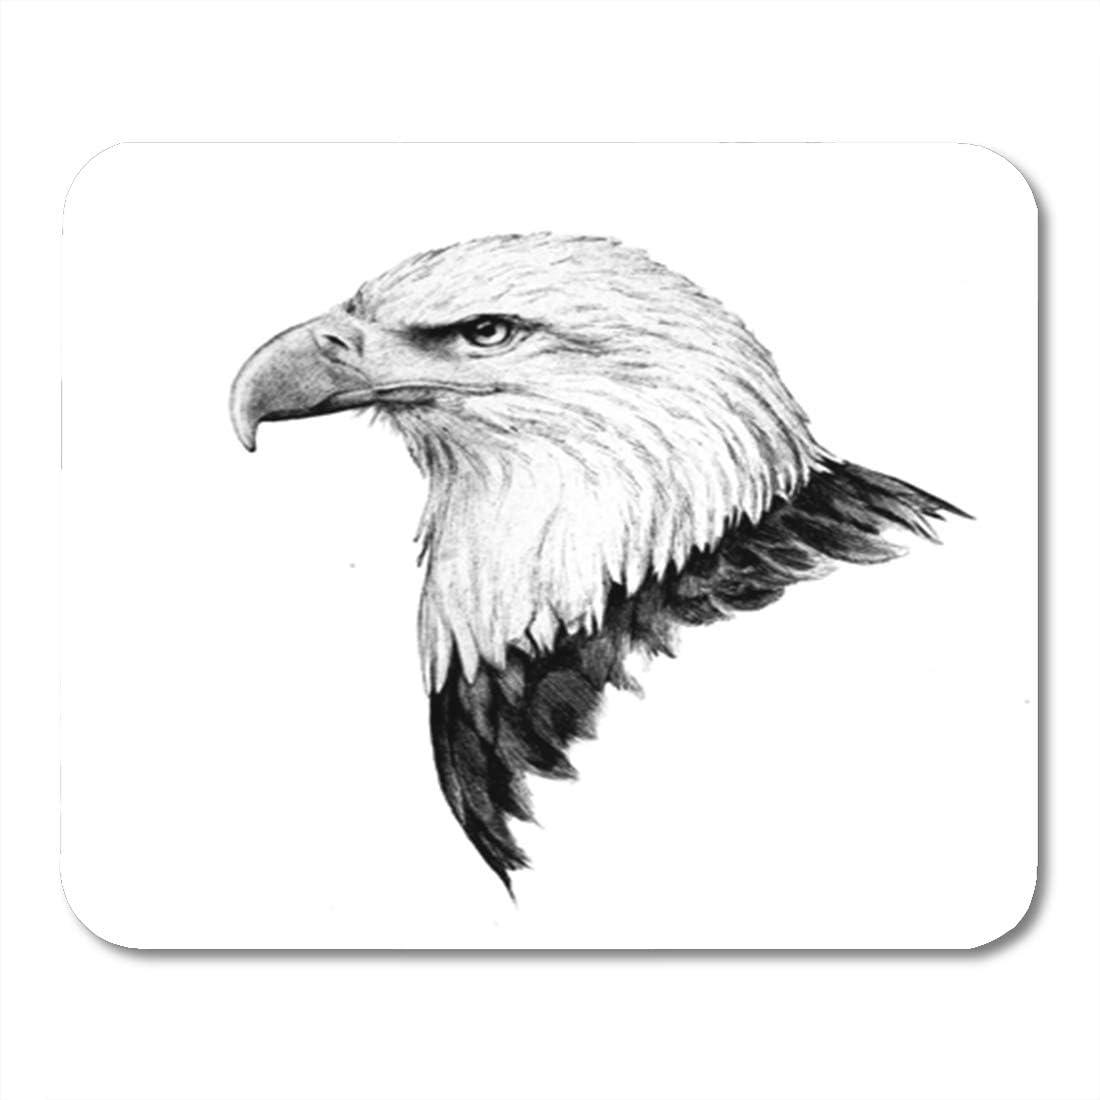 Amazon.com : Semtomn Gaming Mouse Pad Bald Eagle Head Sketch in a ...